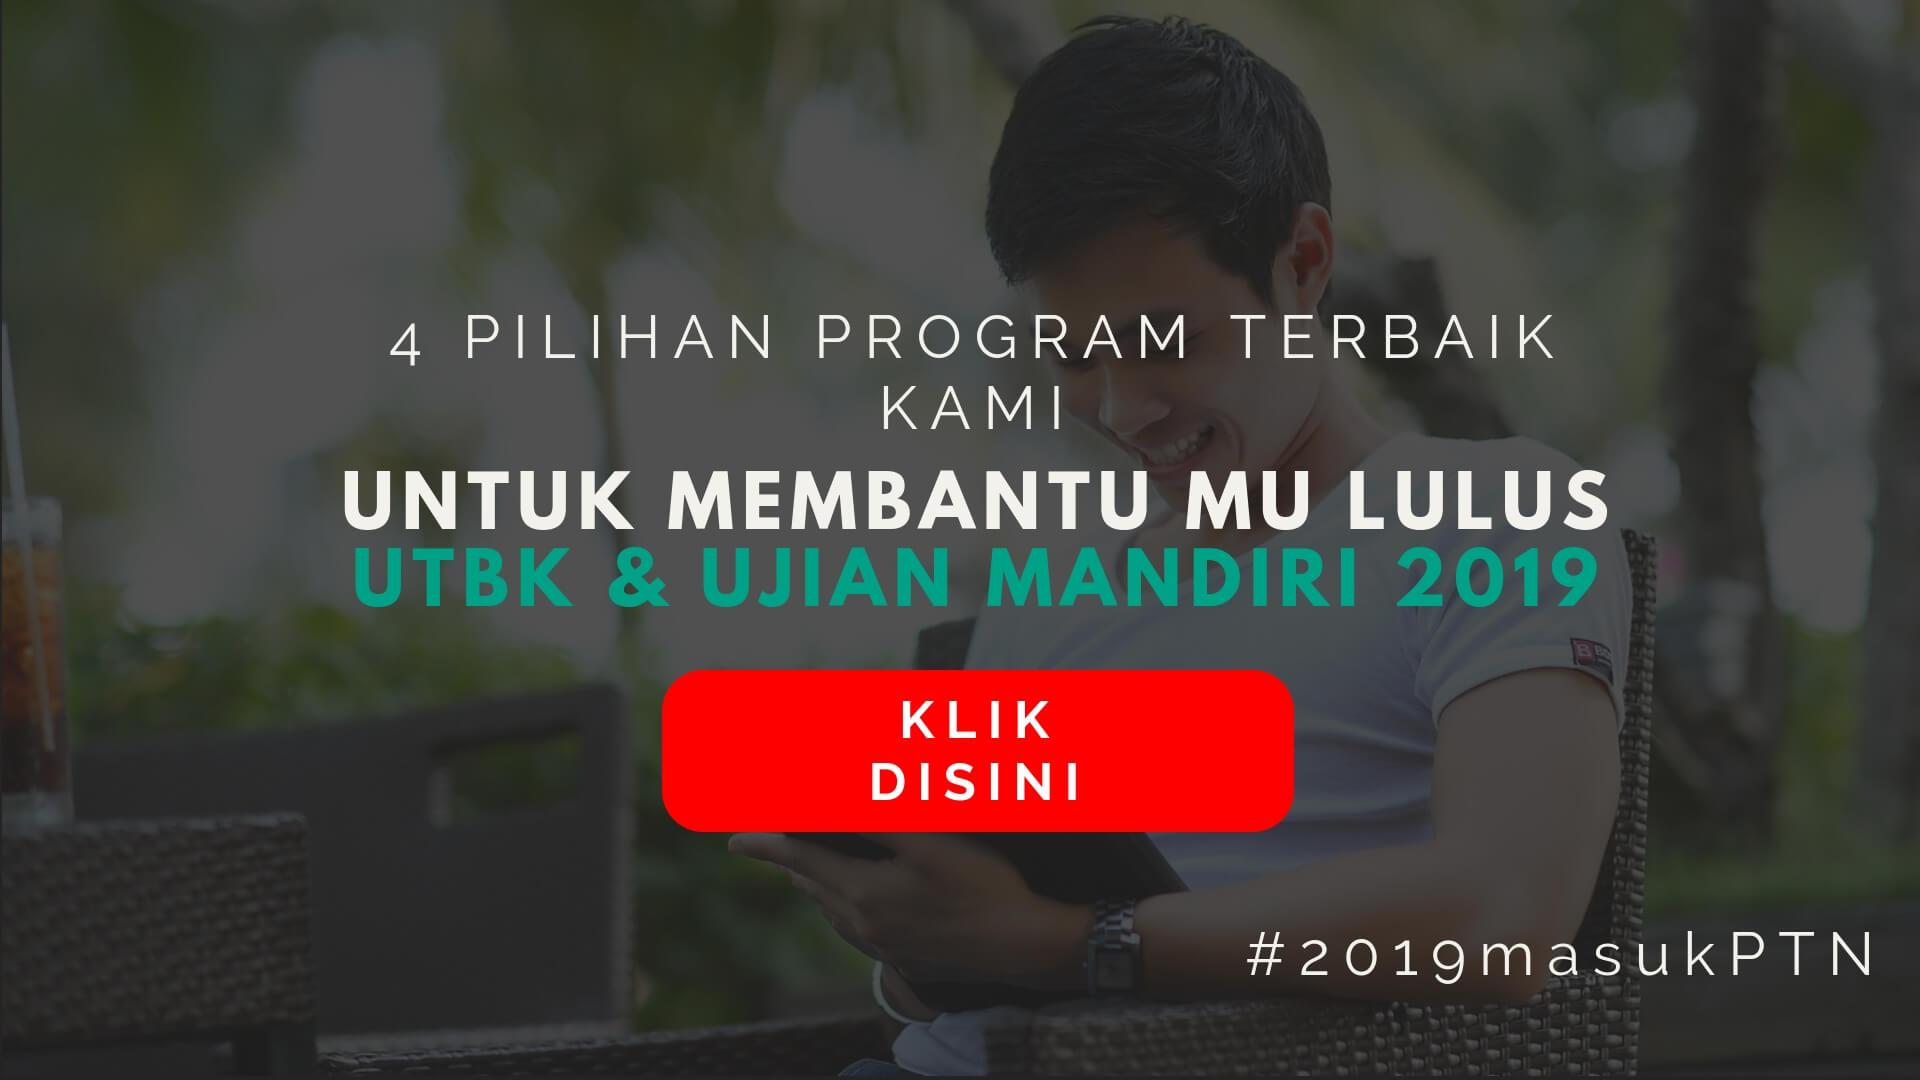 sukses sbmptn 2019